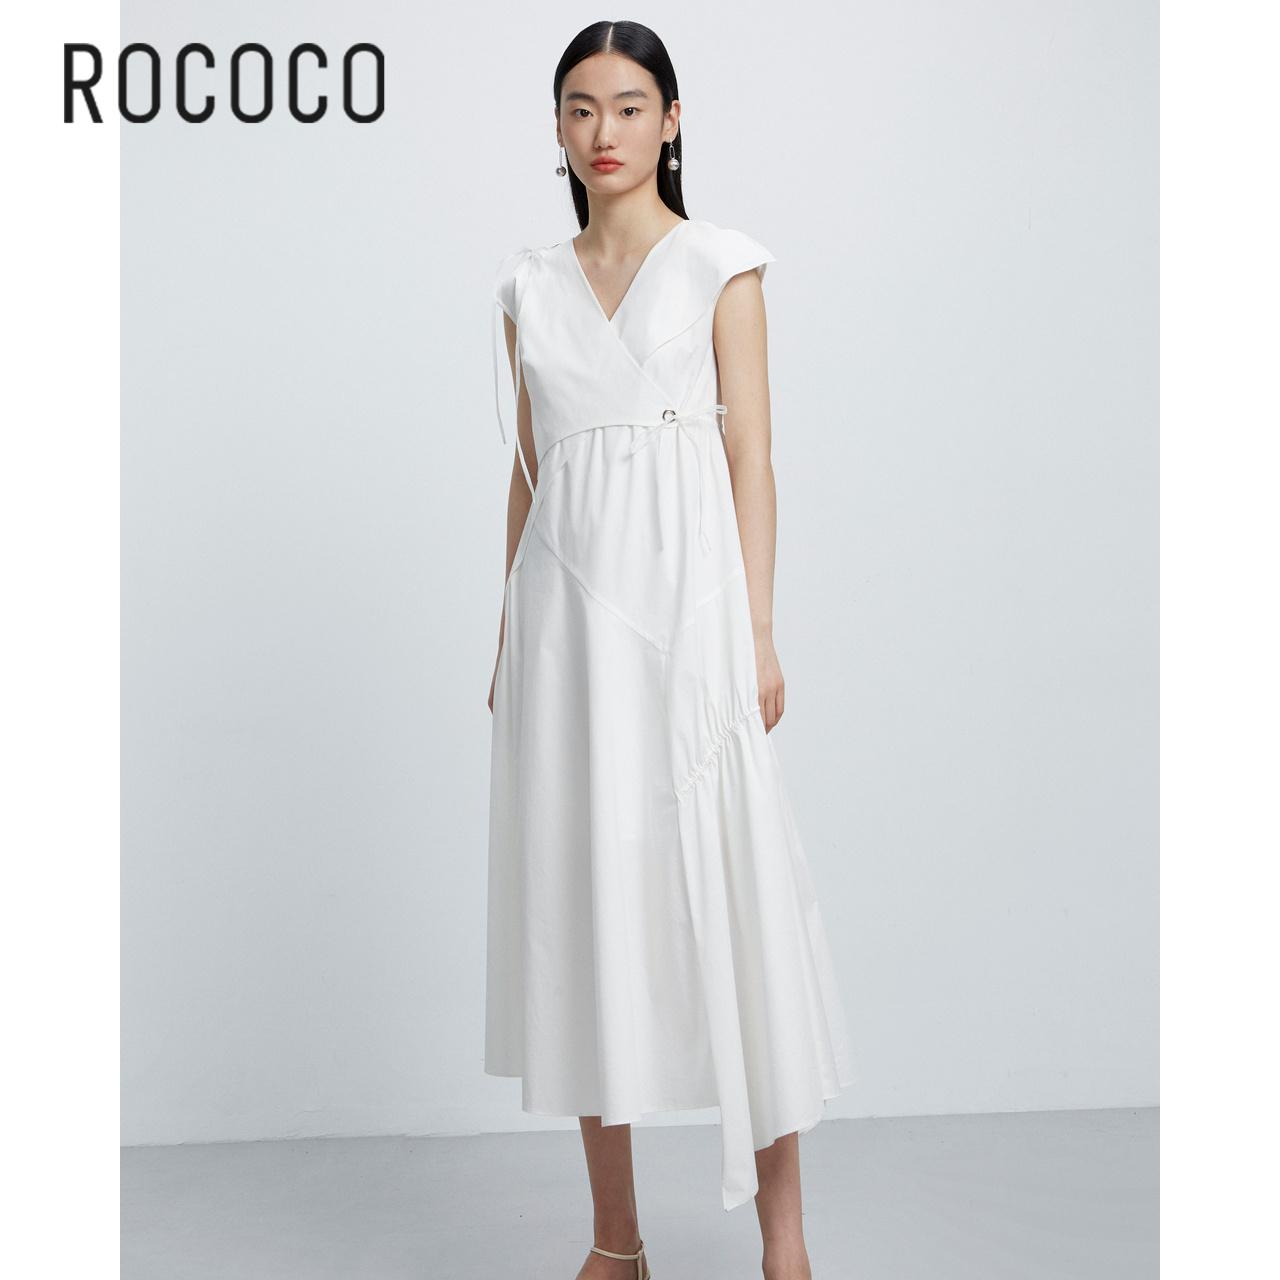 ROCOCO洛可可气质宽松短袖连衣裙长裙女2021夏292013TA1124